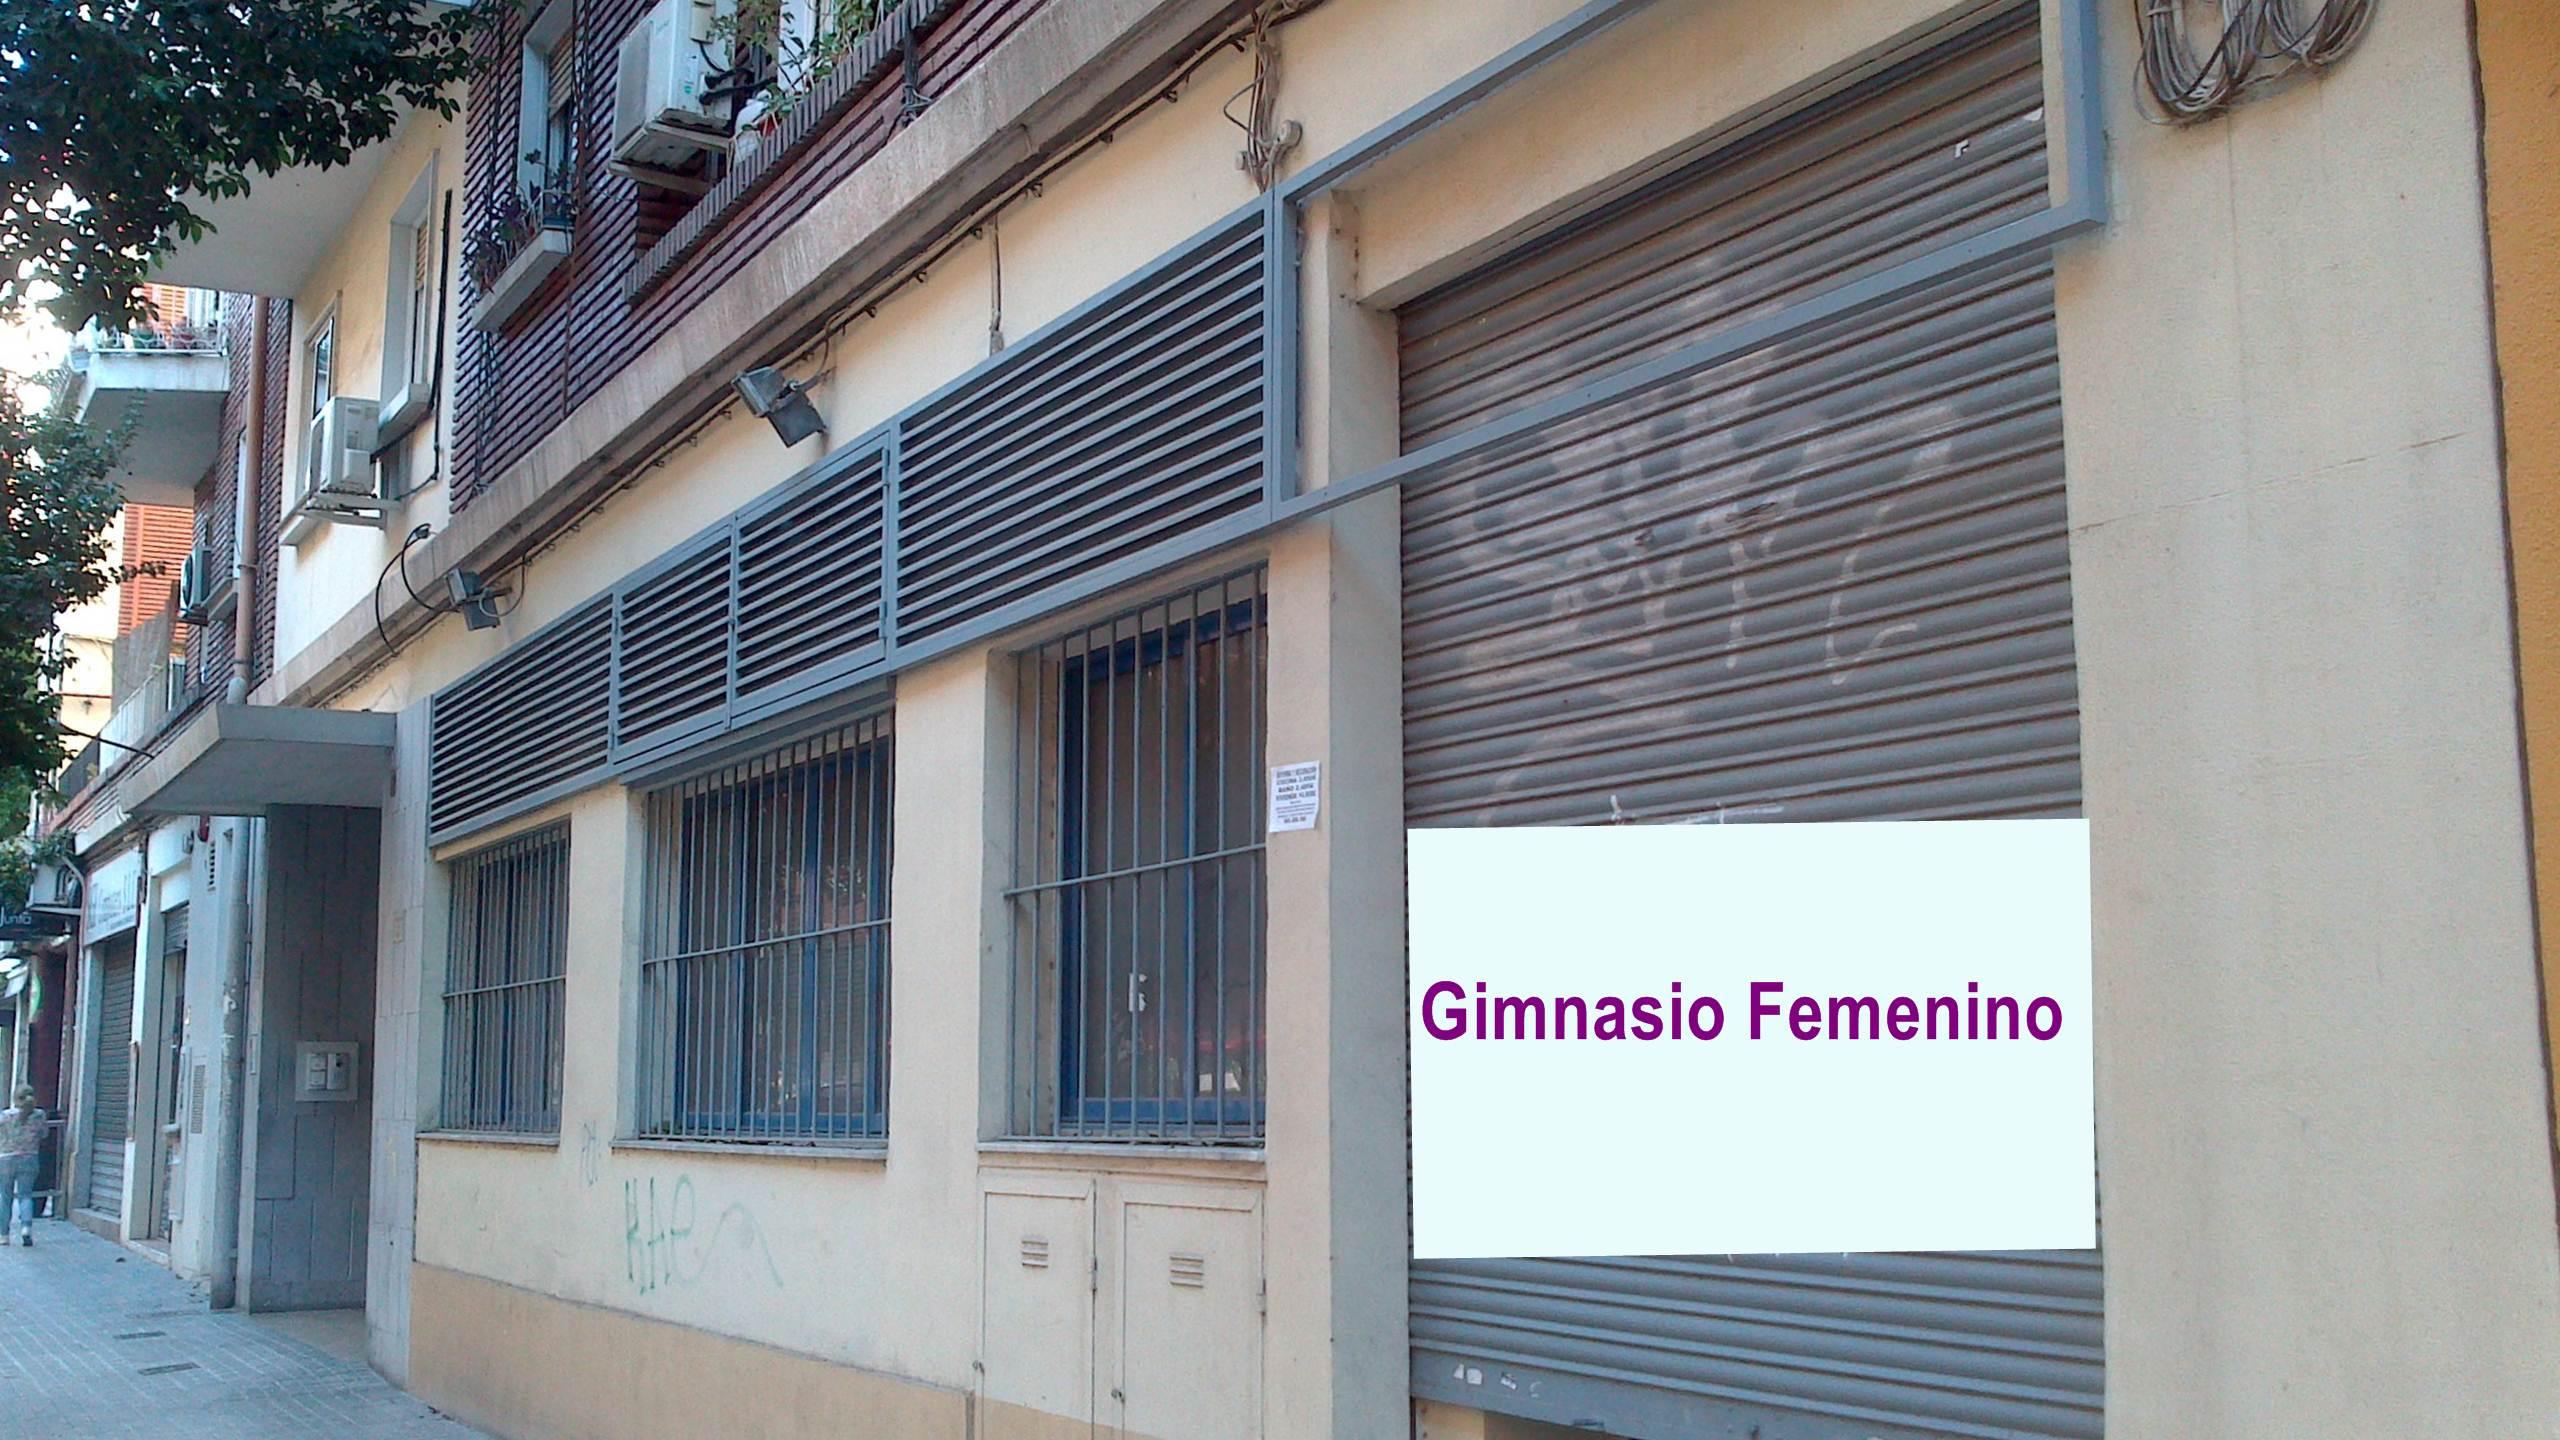 Nuevo proyecto gimnasio femenino ominarq - Calle valencia salamanca ...